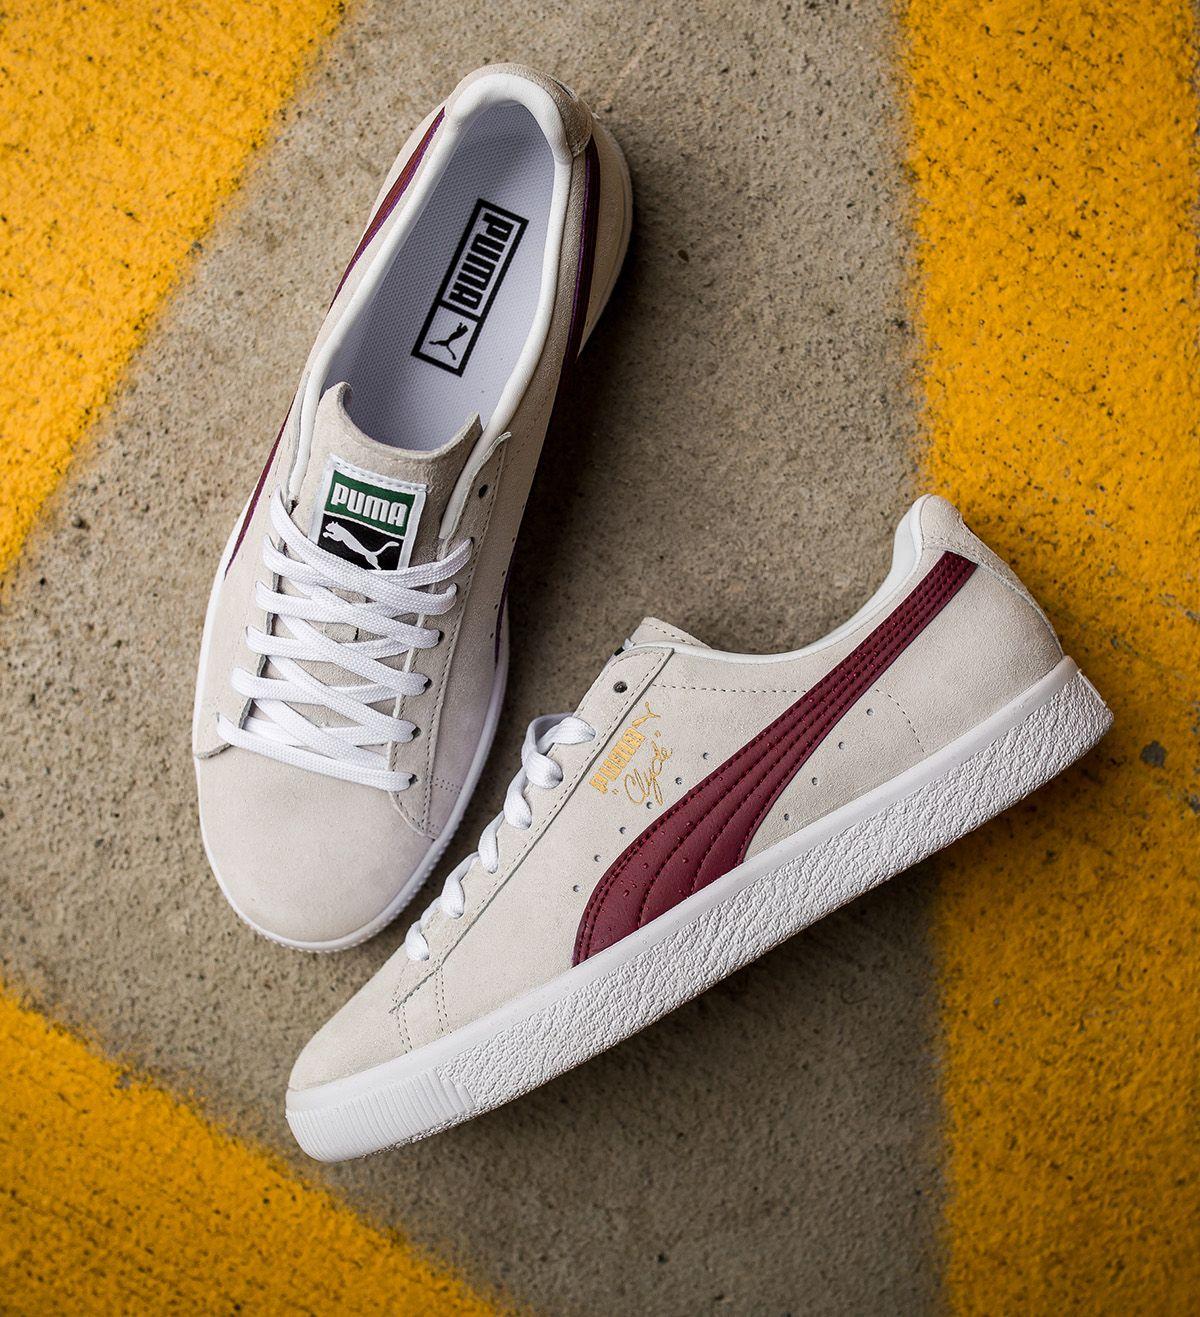 cfbeff68b Puma Clyde in Two Premium Editions for June 2017 - EU Kicks  Sneaker  Magazine